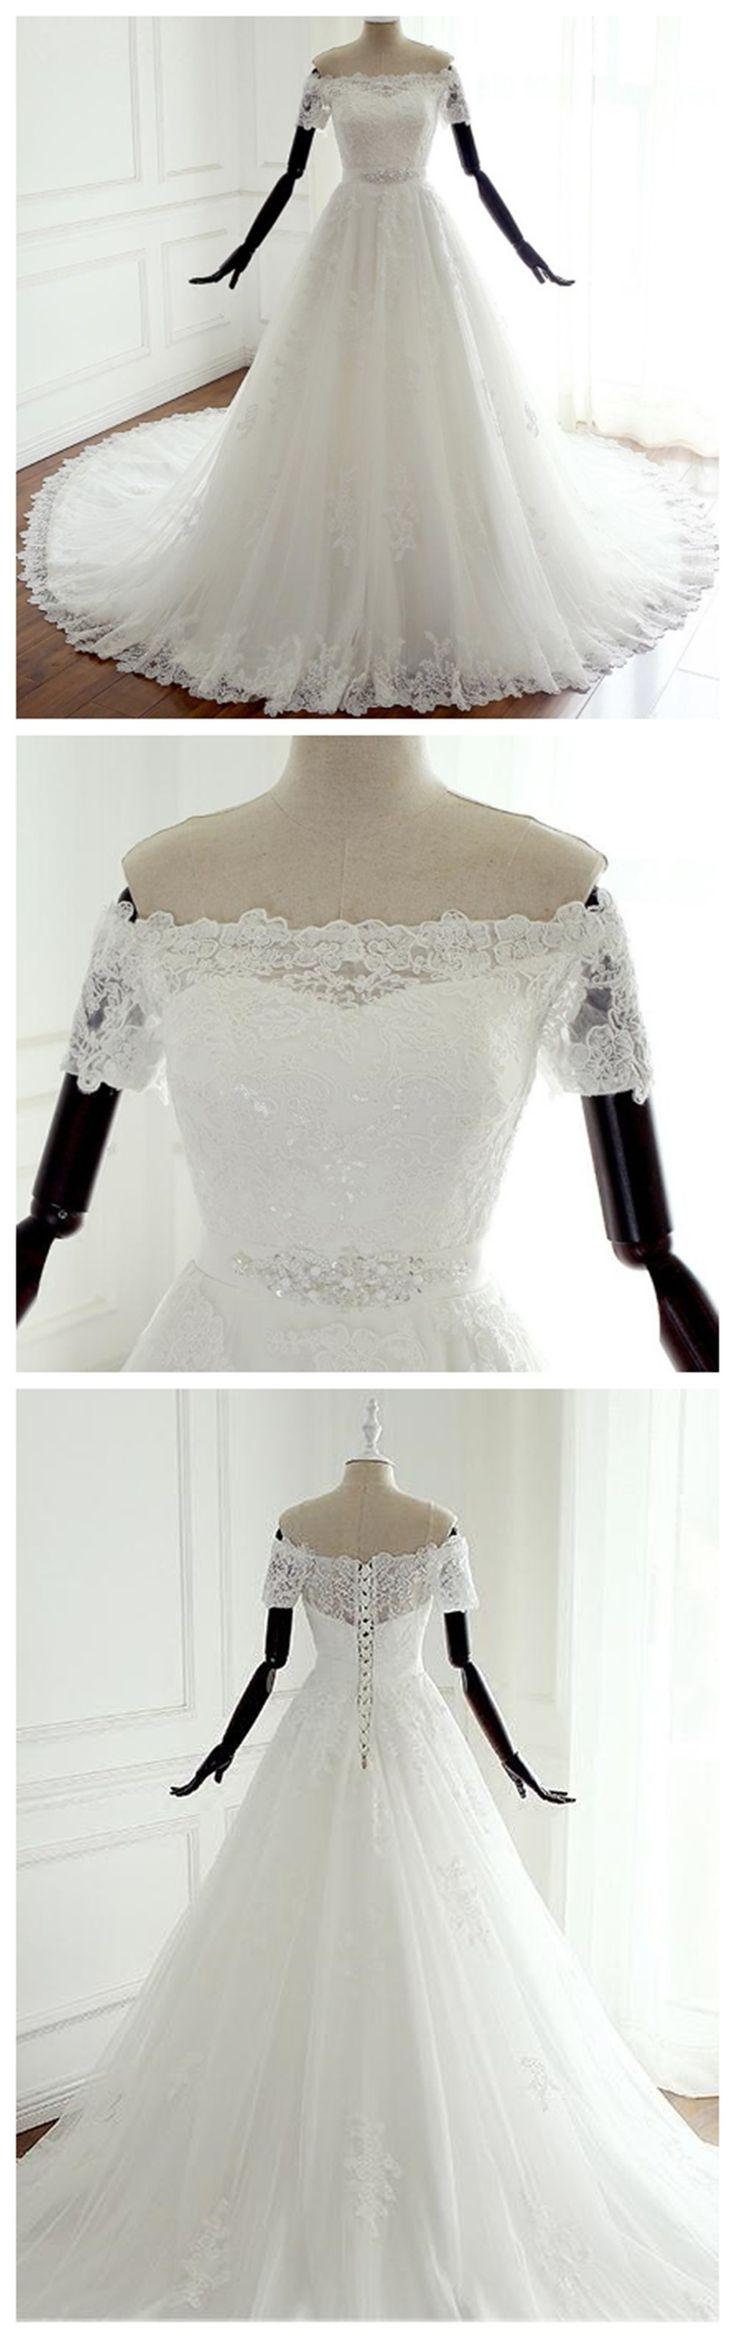 Off Shoulder Short Sleeve Lace Beaded A line Wedding Bridal Dresses, Custom Made Wedding Dresses, Affordable Wedding Bridal Gowns, WD256